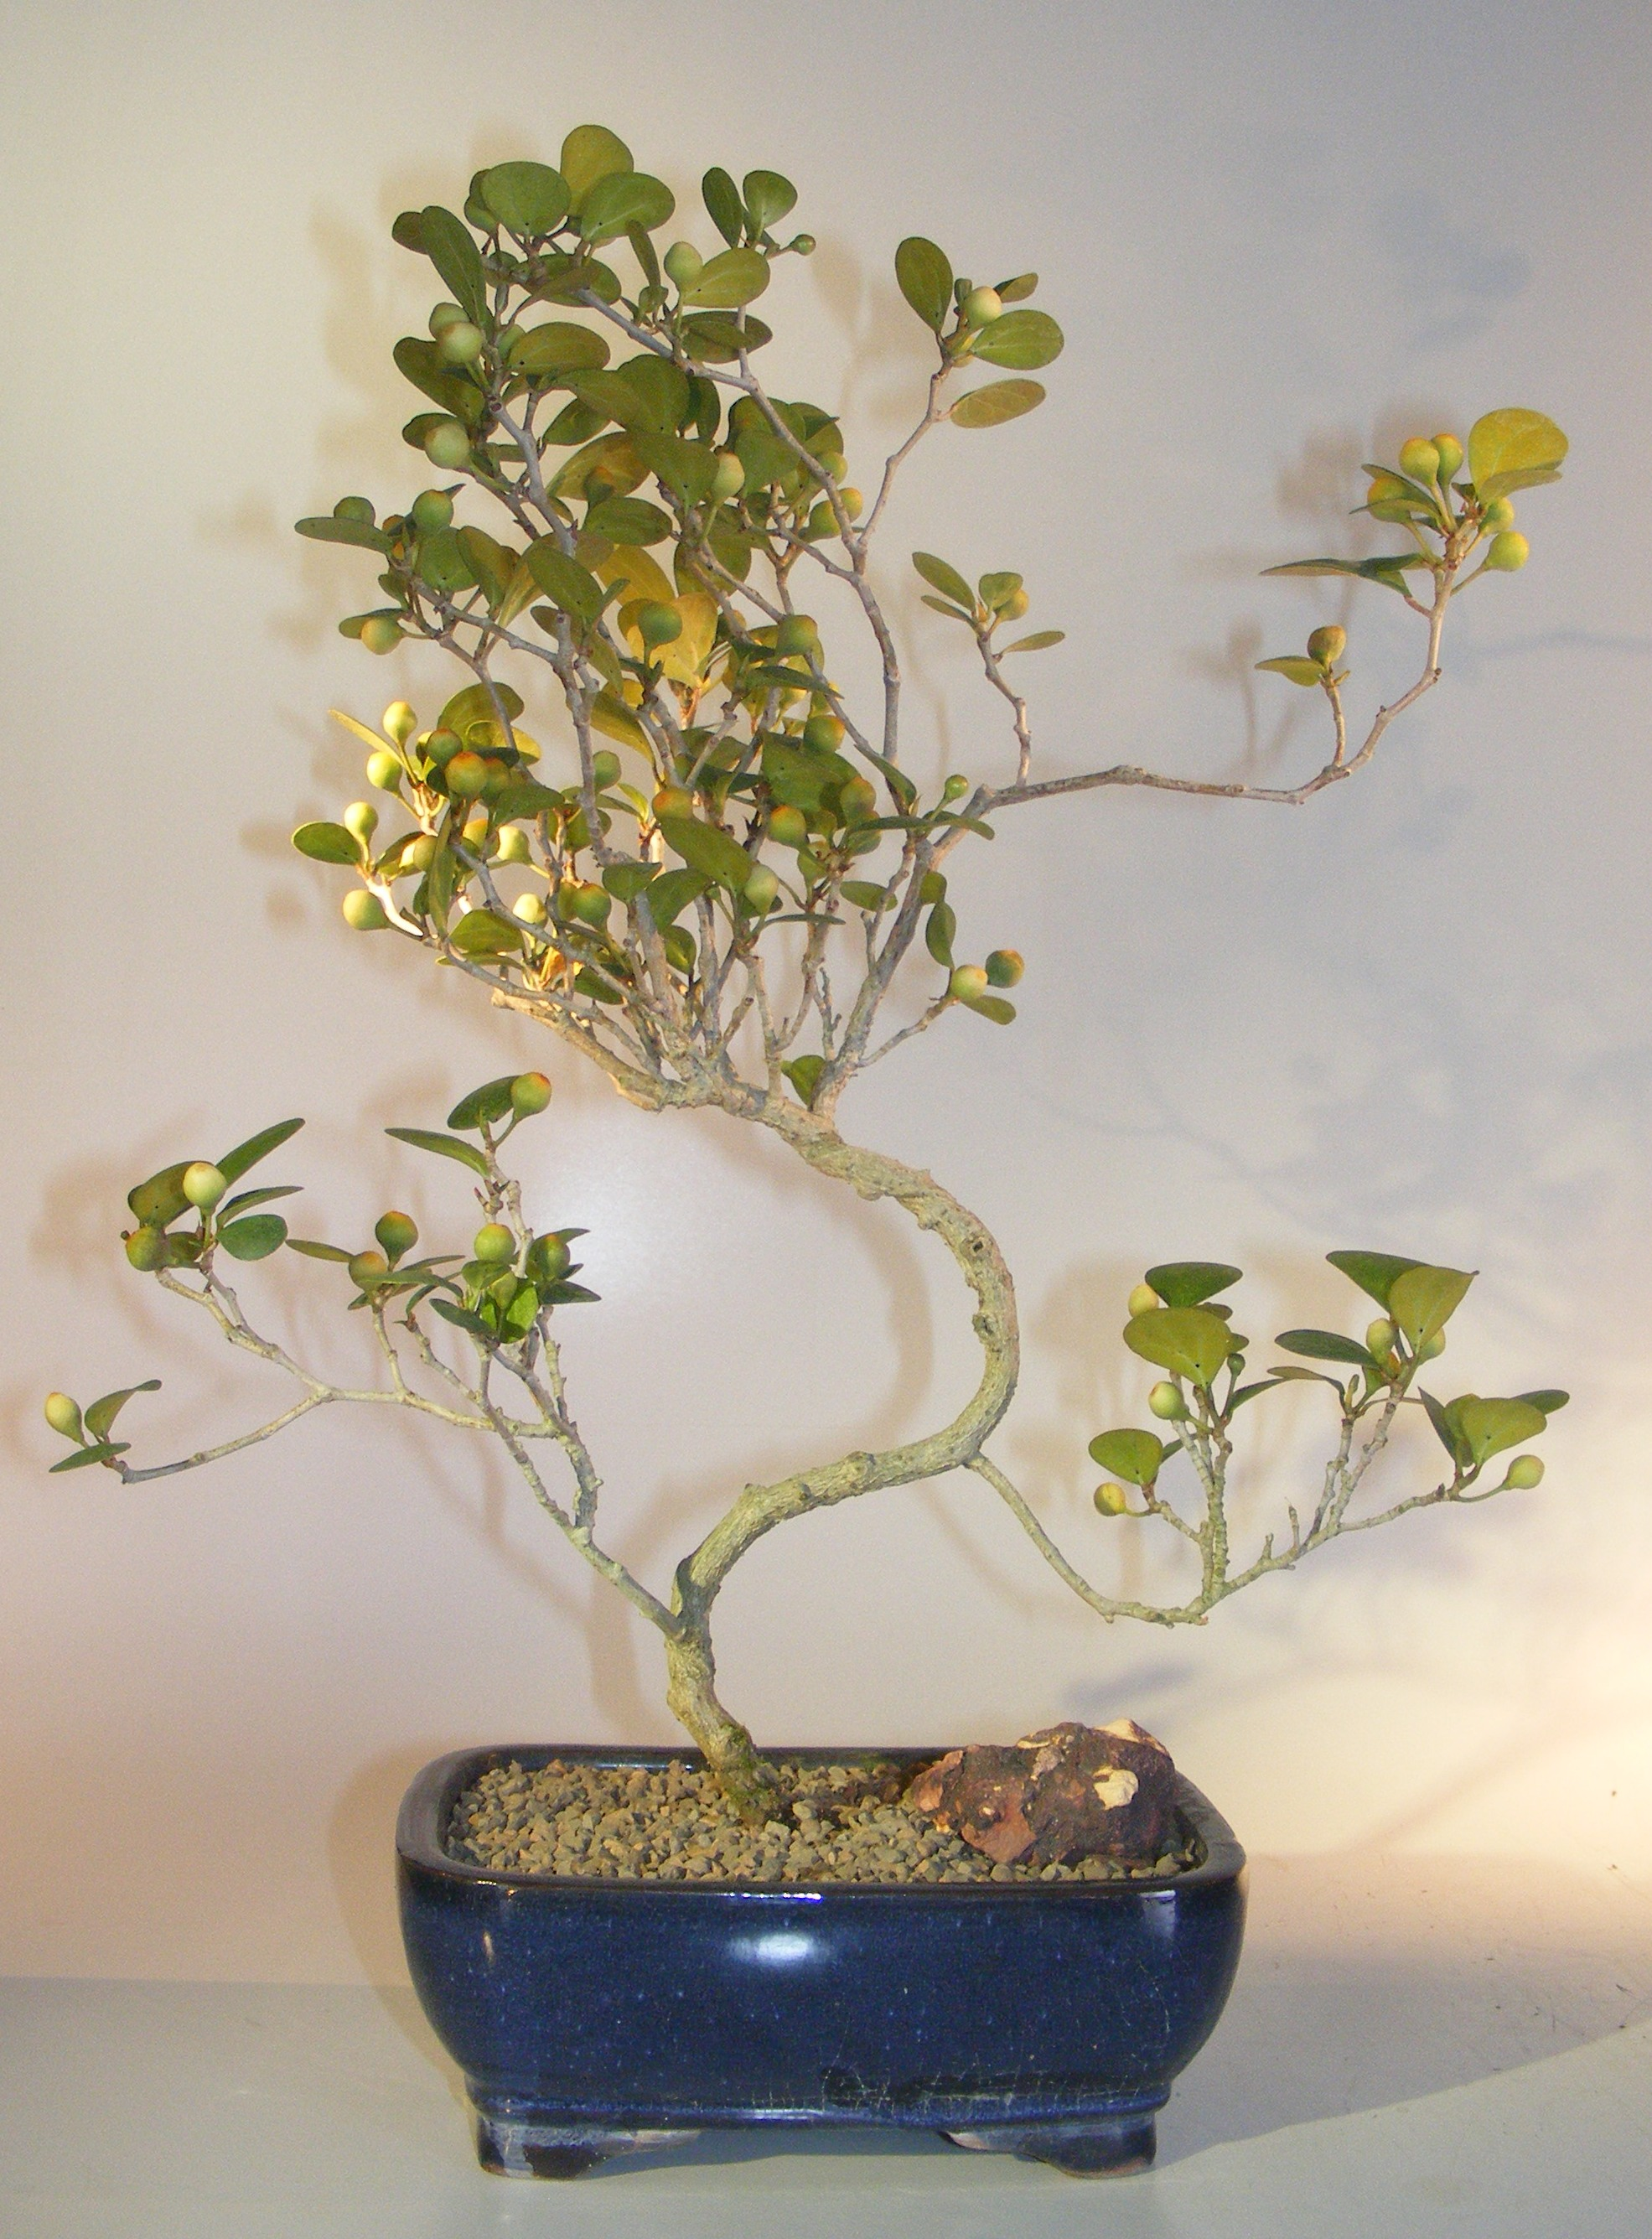 Mistletoe Fig Bonsai TreeCurved Trunk Style(ficus diversifolia) Image